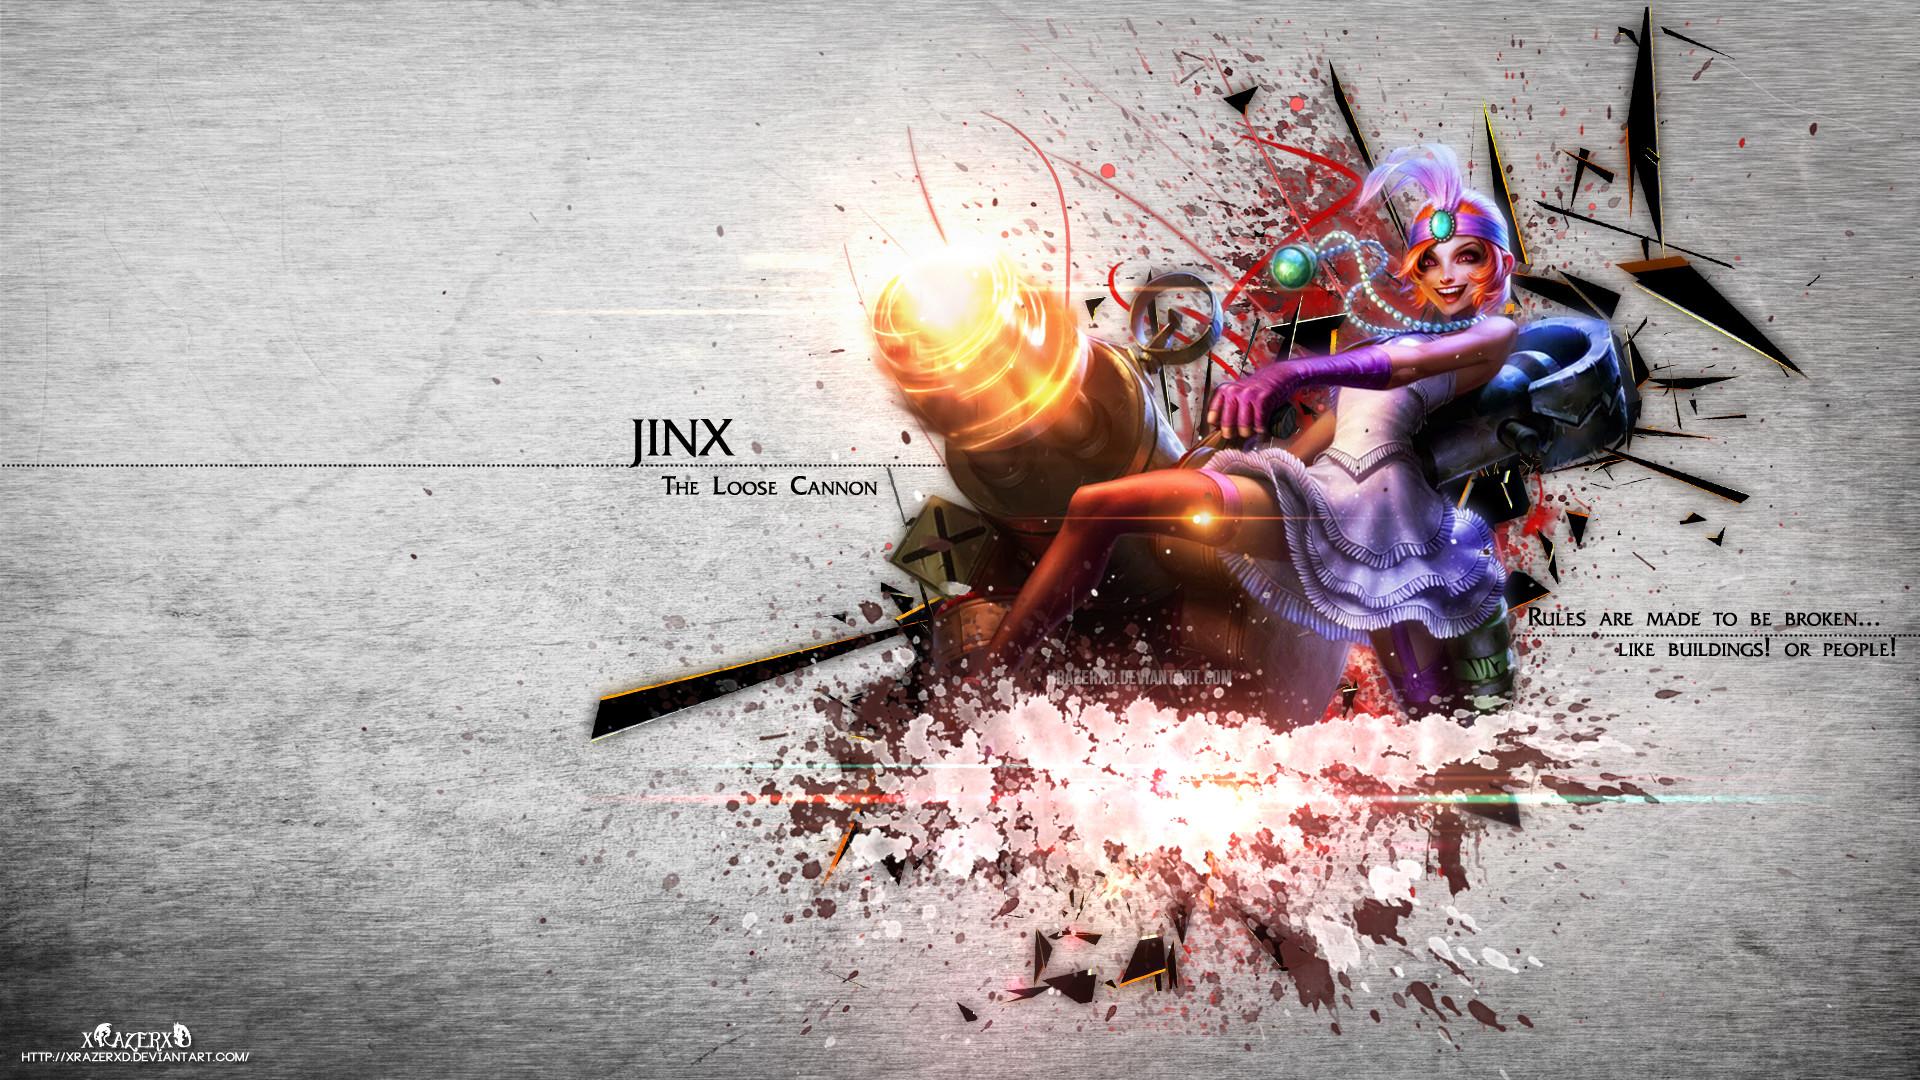 Video Game – League Of Legends Jinx (League Of Legends) Wallpaper